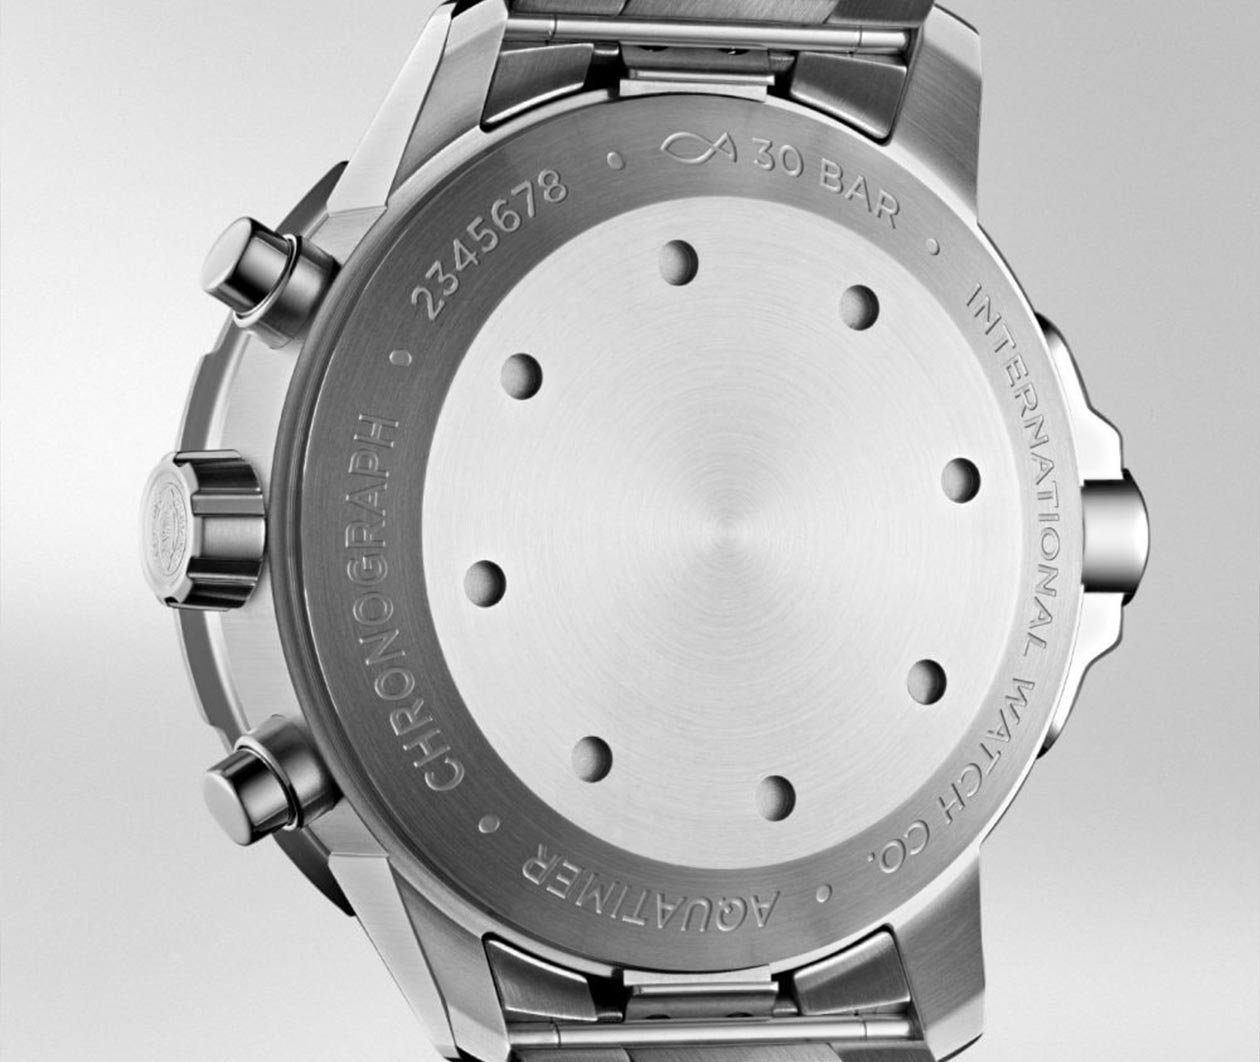 IWC Aquatimer Chronograph IW376804 Carousel 5 FINAL